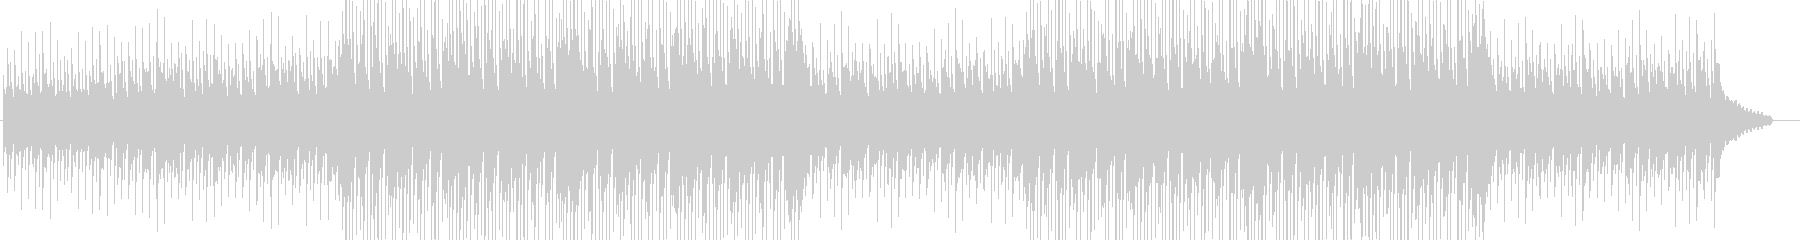 Happy Ukulele 15の未再生の波形